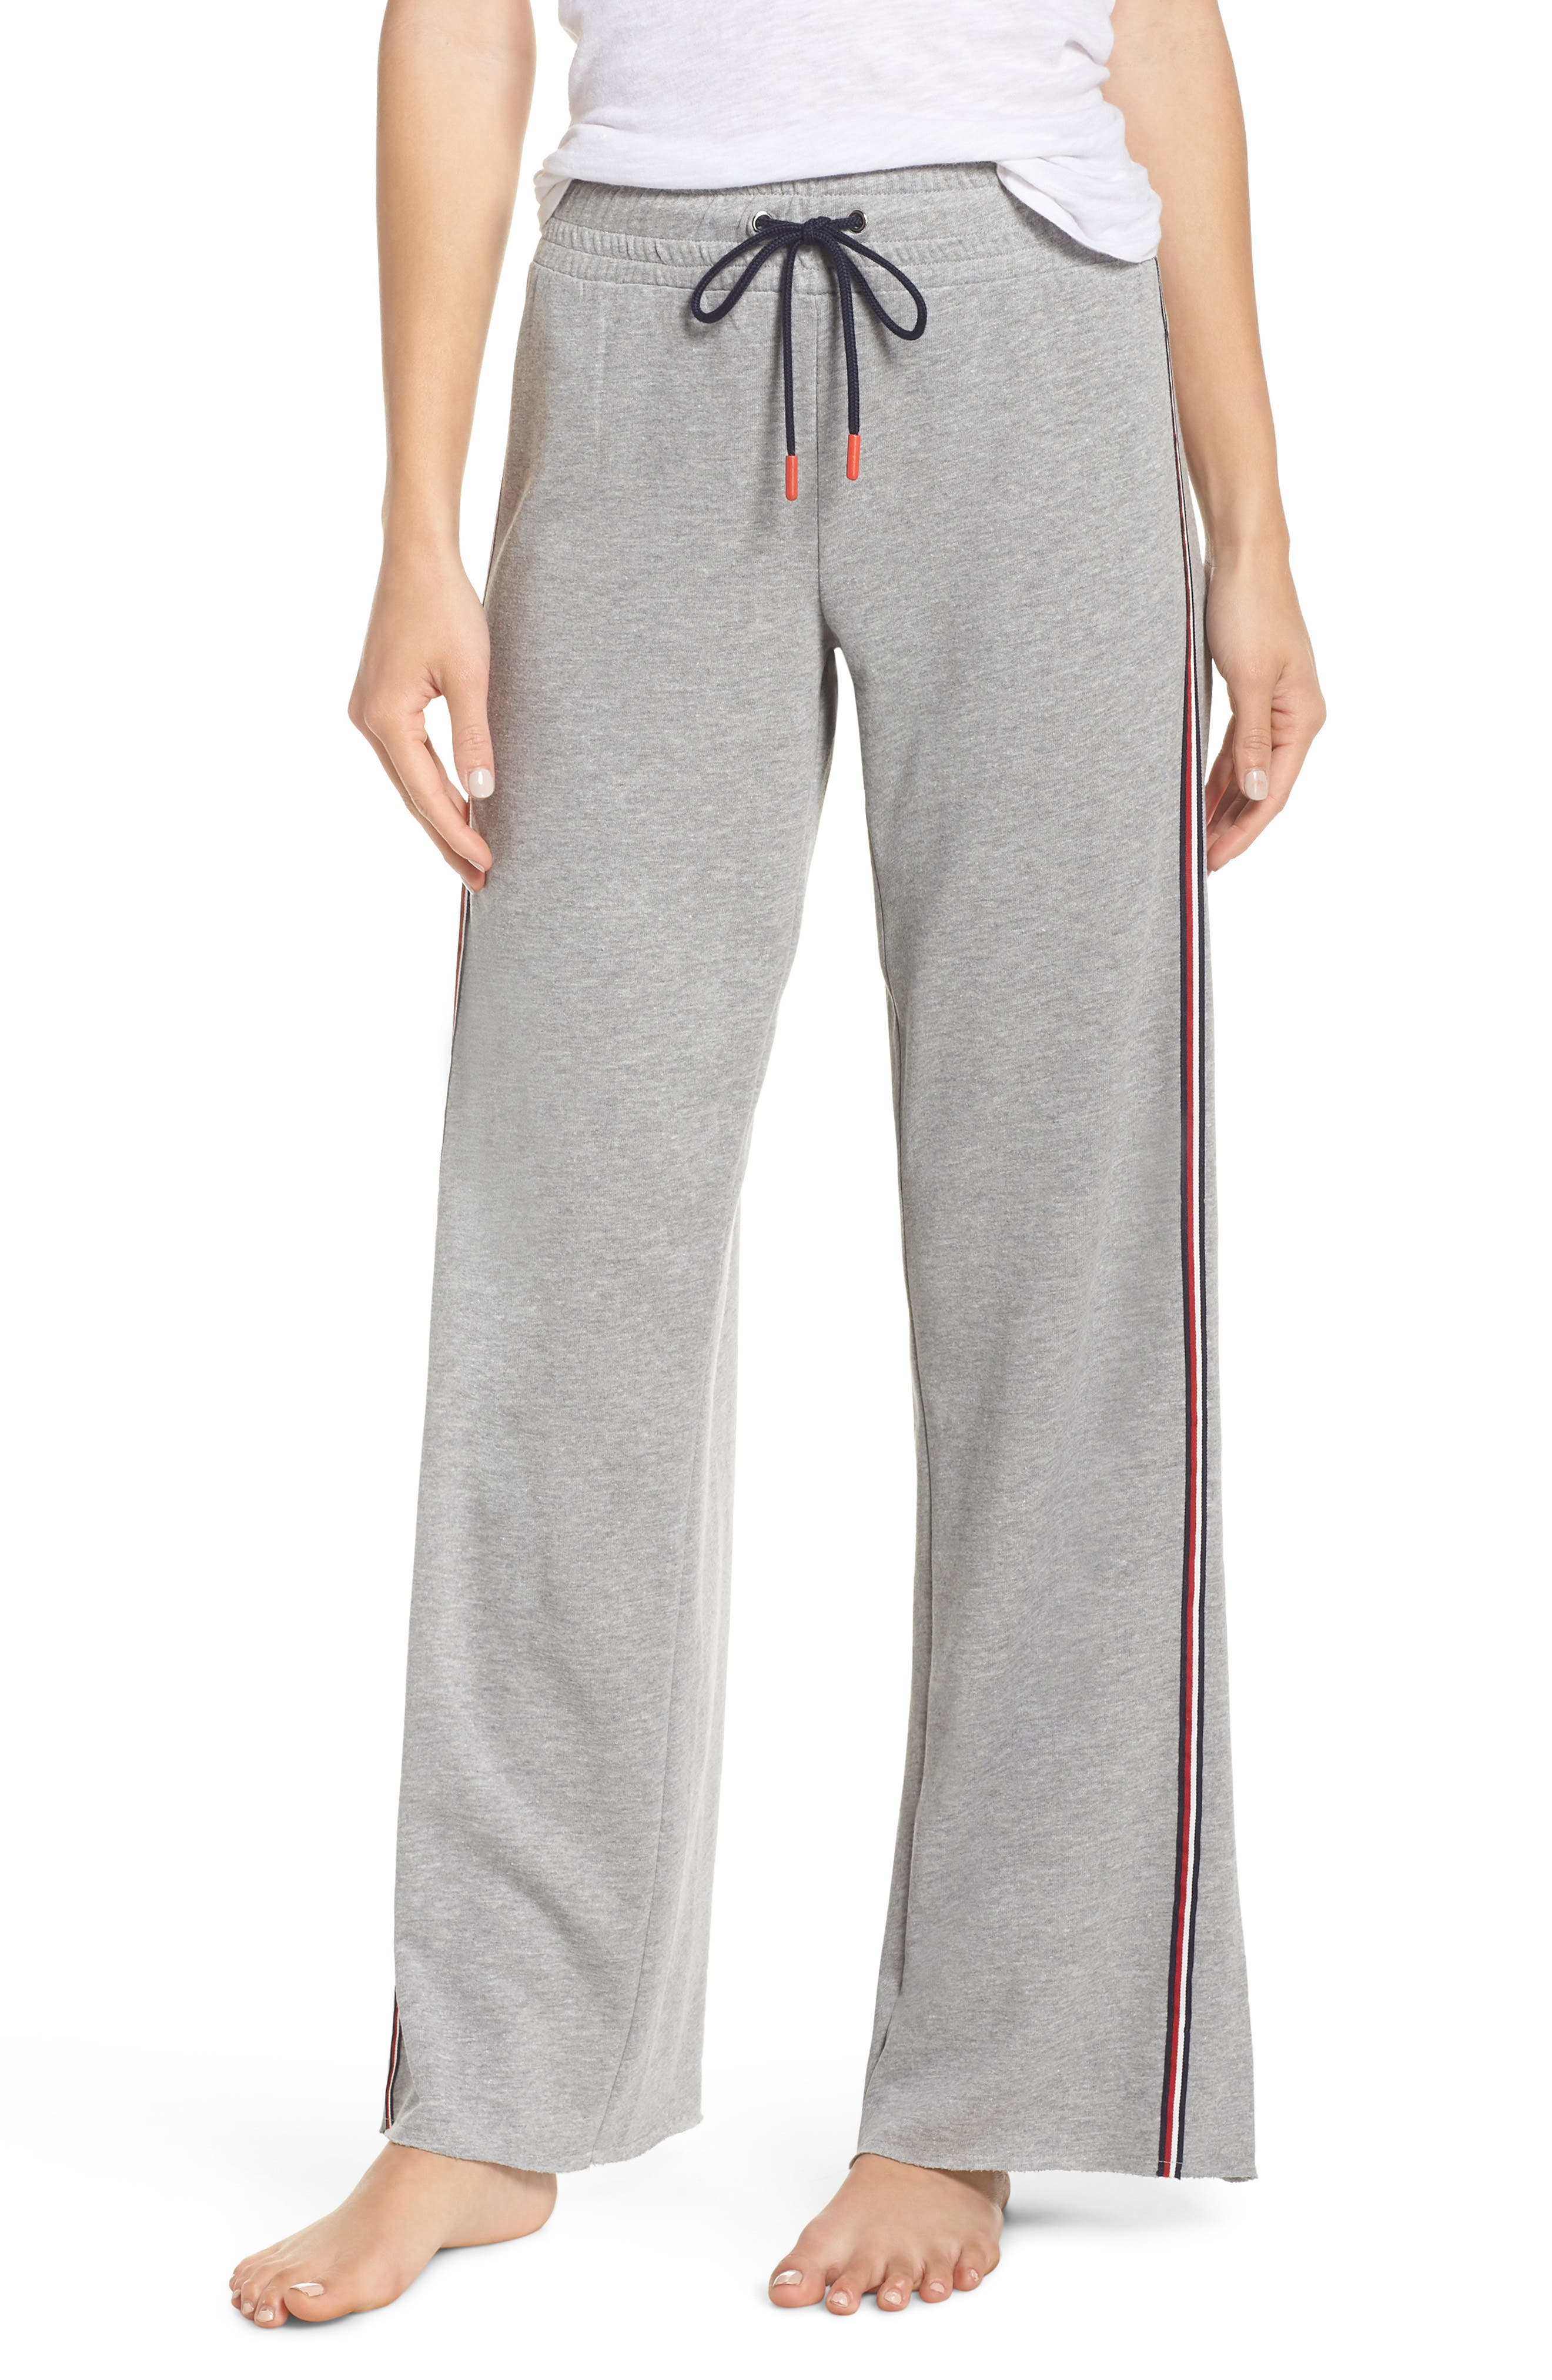 Boyfriend Lounge Pants,                         Main,                         color, HEATHER GREY